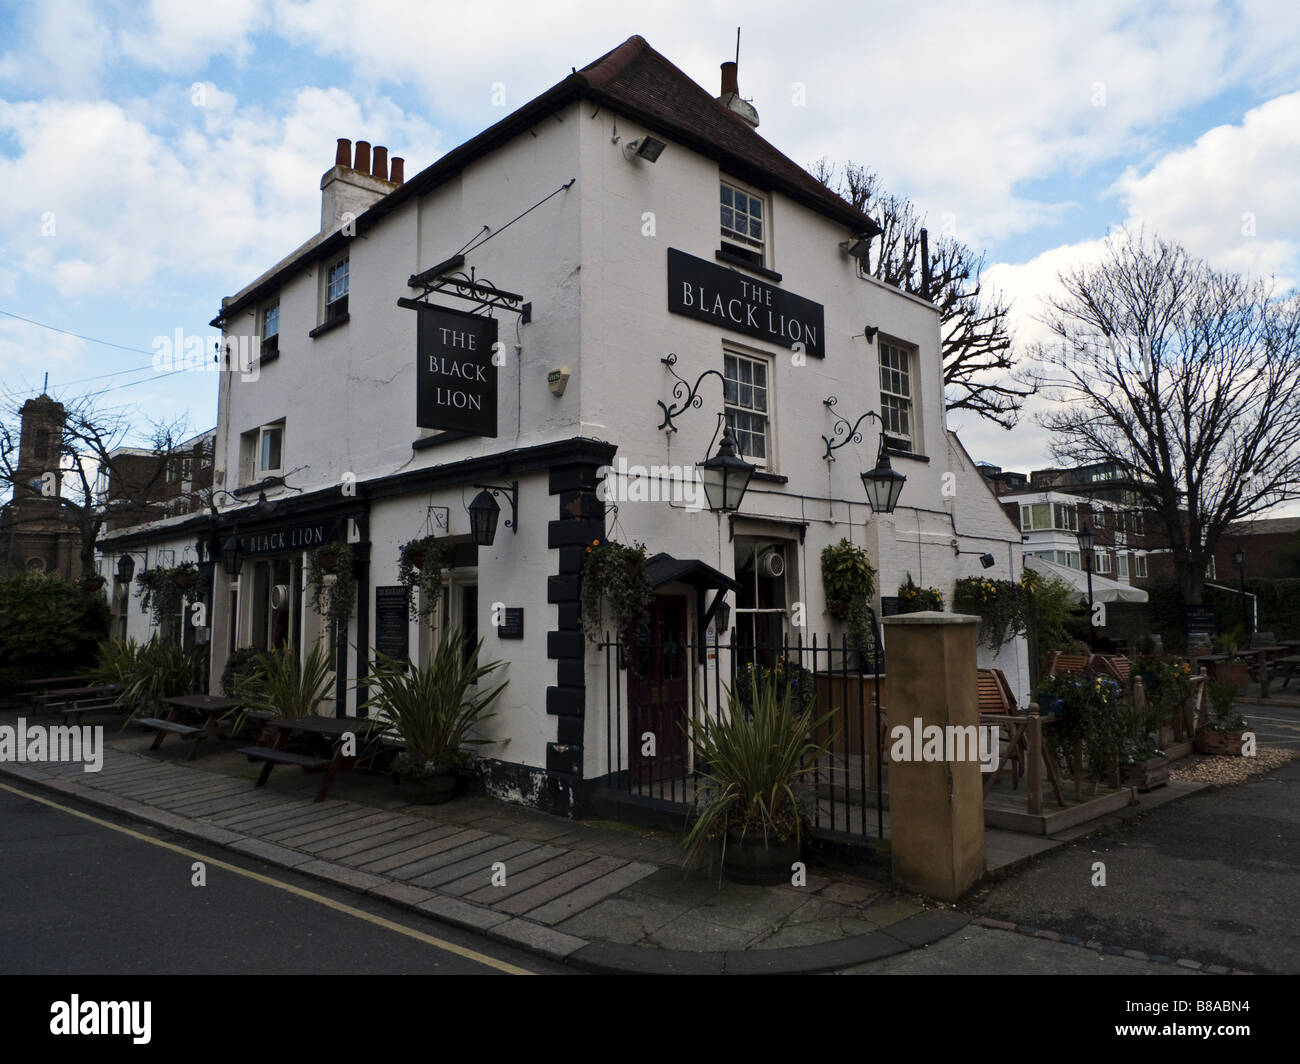 Black Lion Pub, Chiswick - Stock Image